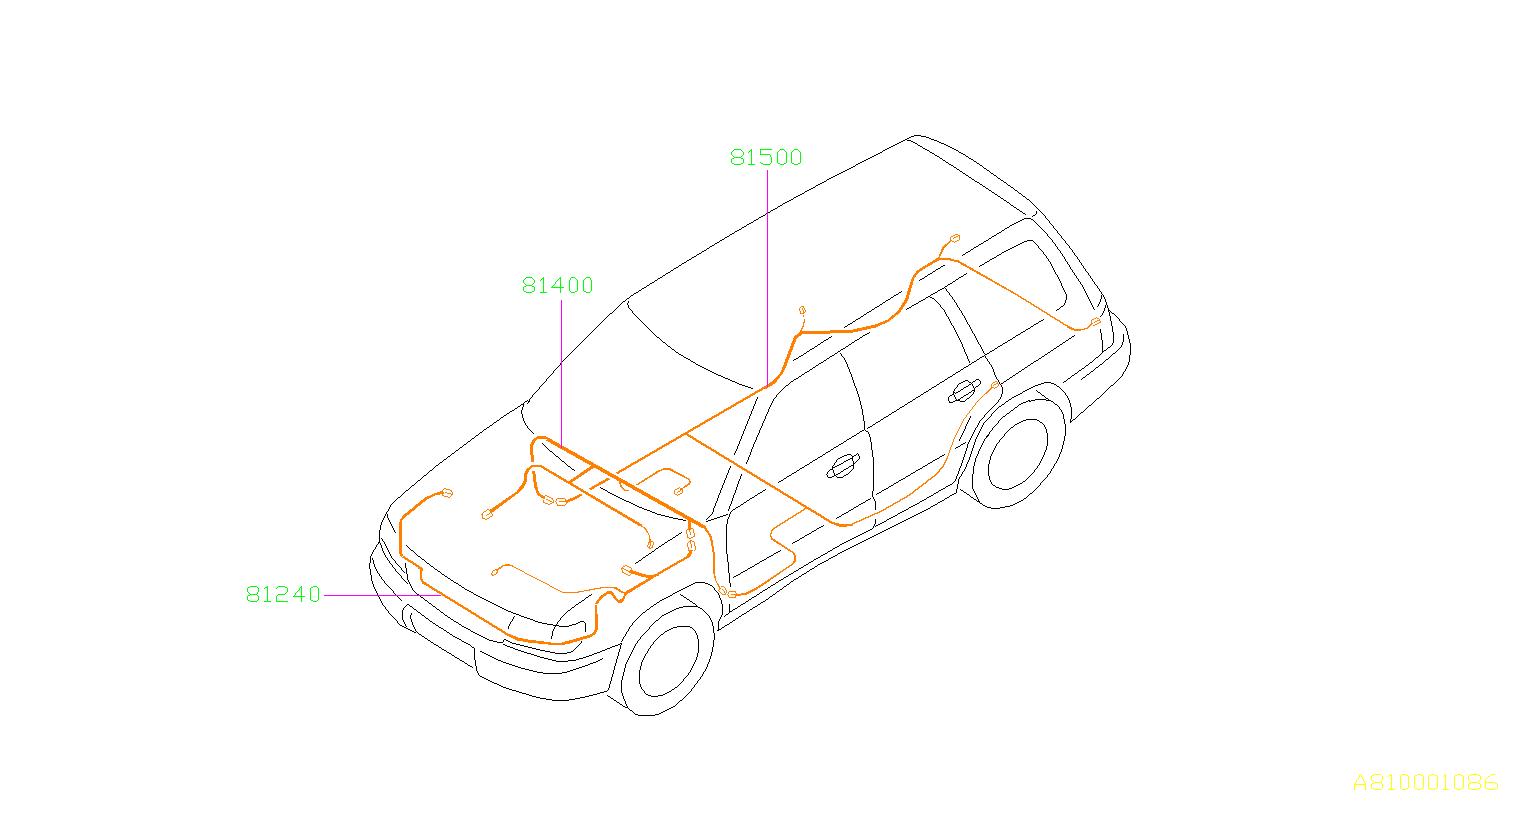 Subaru Forester Harness Bulkhead Utu0u1 Main Wiring